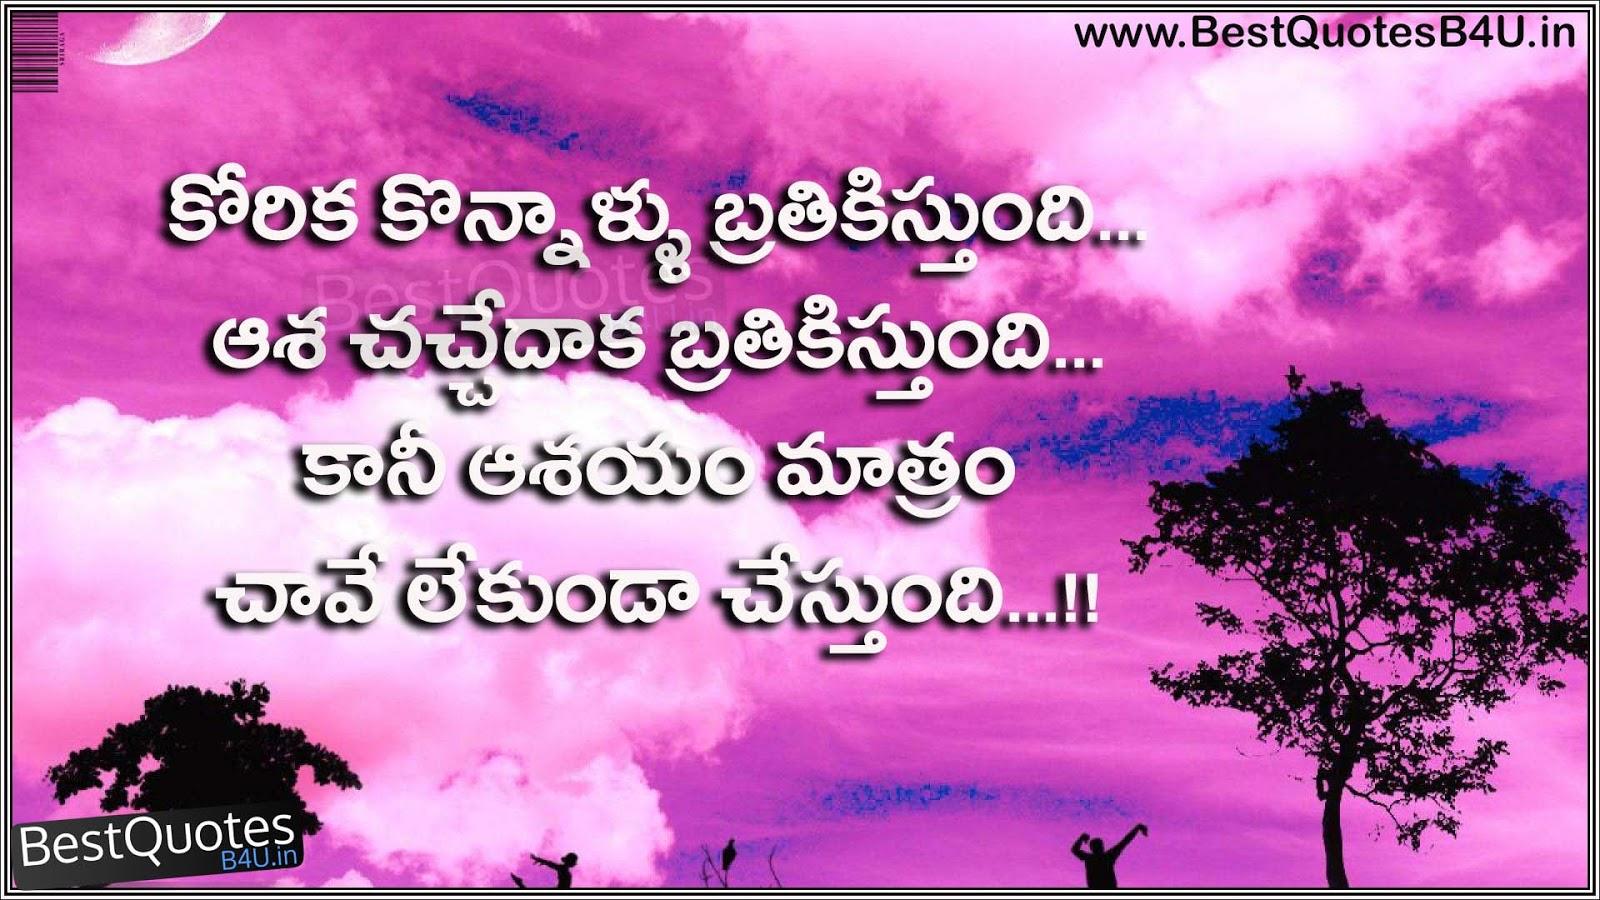 Best Telugu Good Night Greetings Messages Bestquotesb4u English